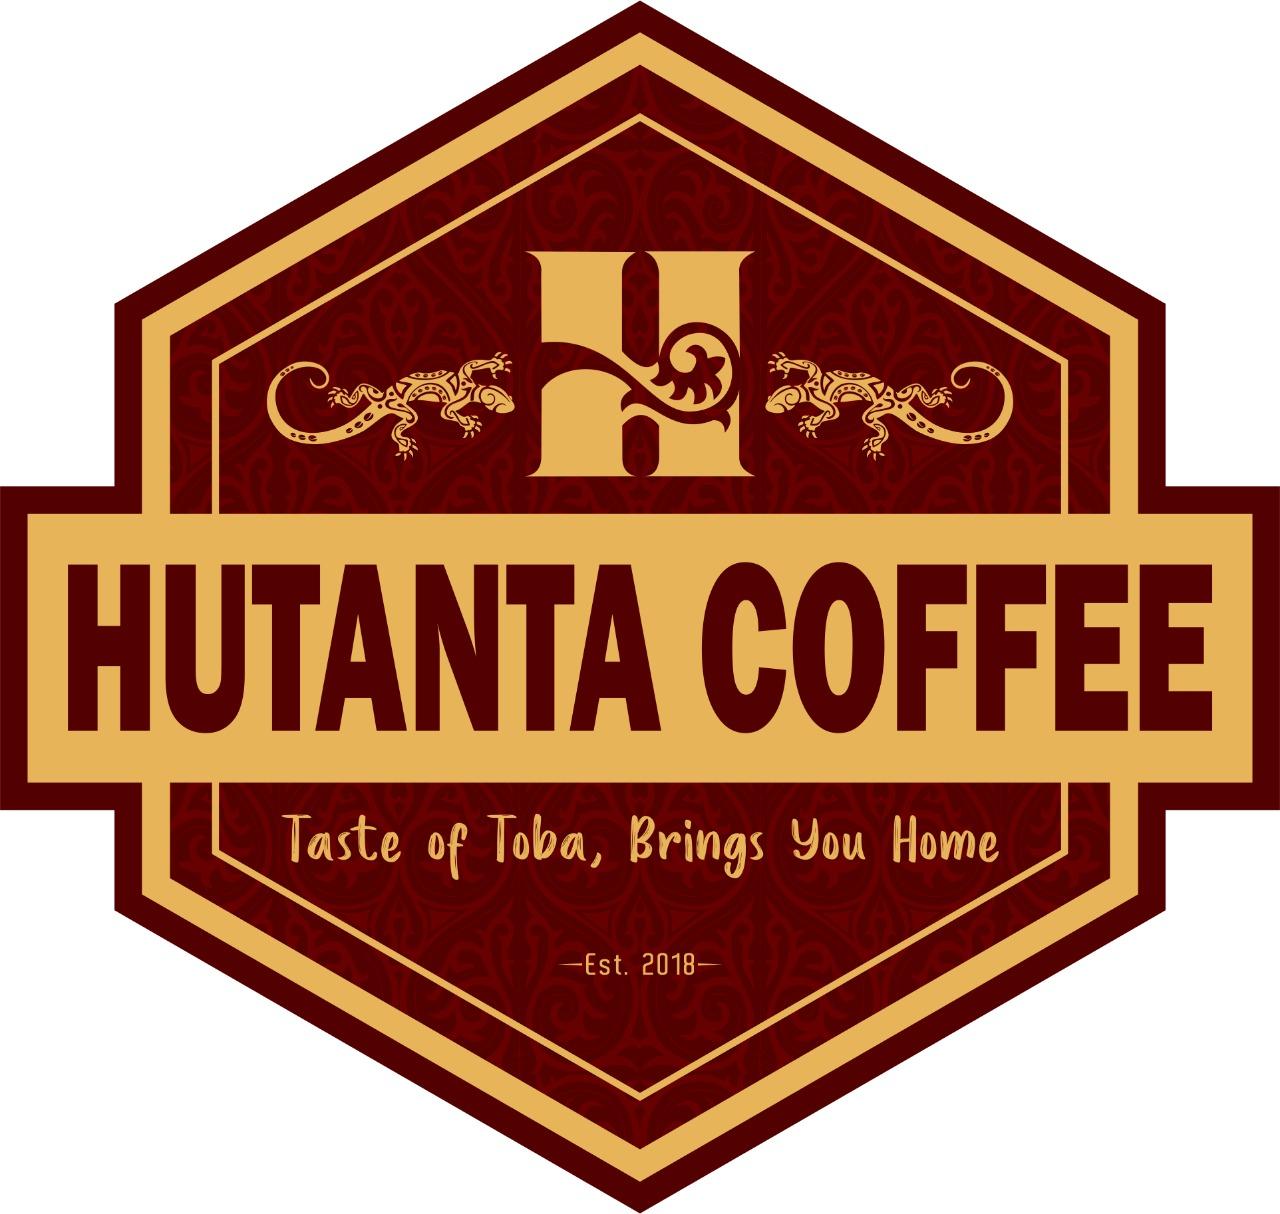 Hutanta Coffee